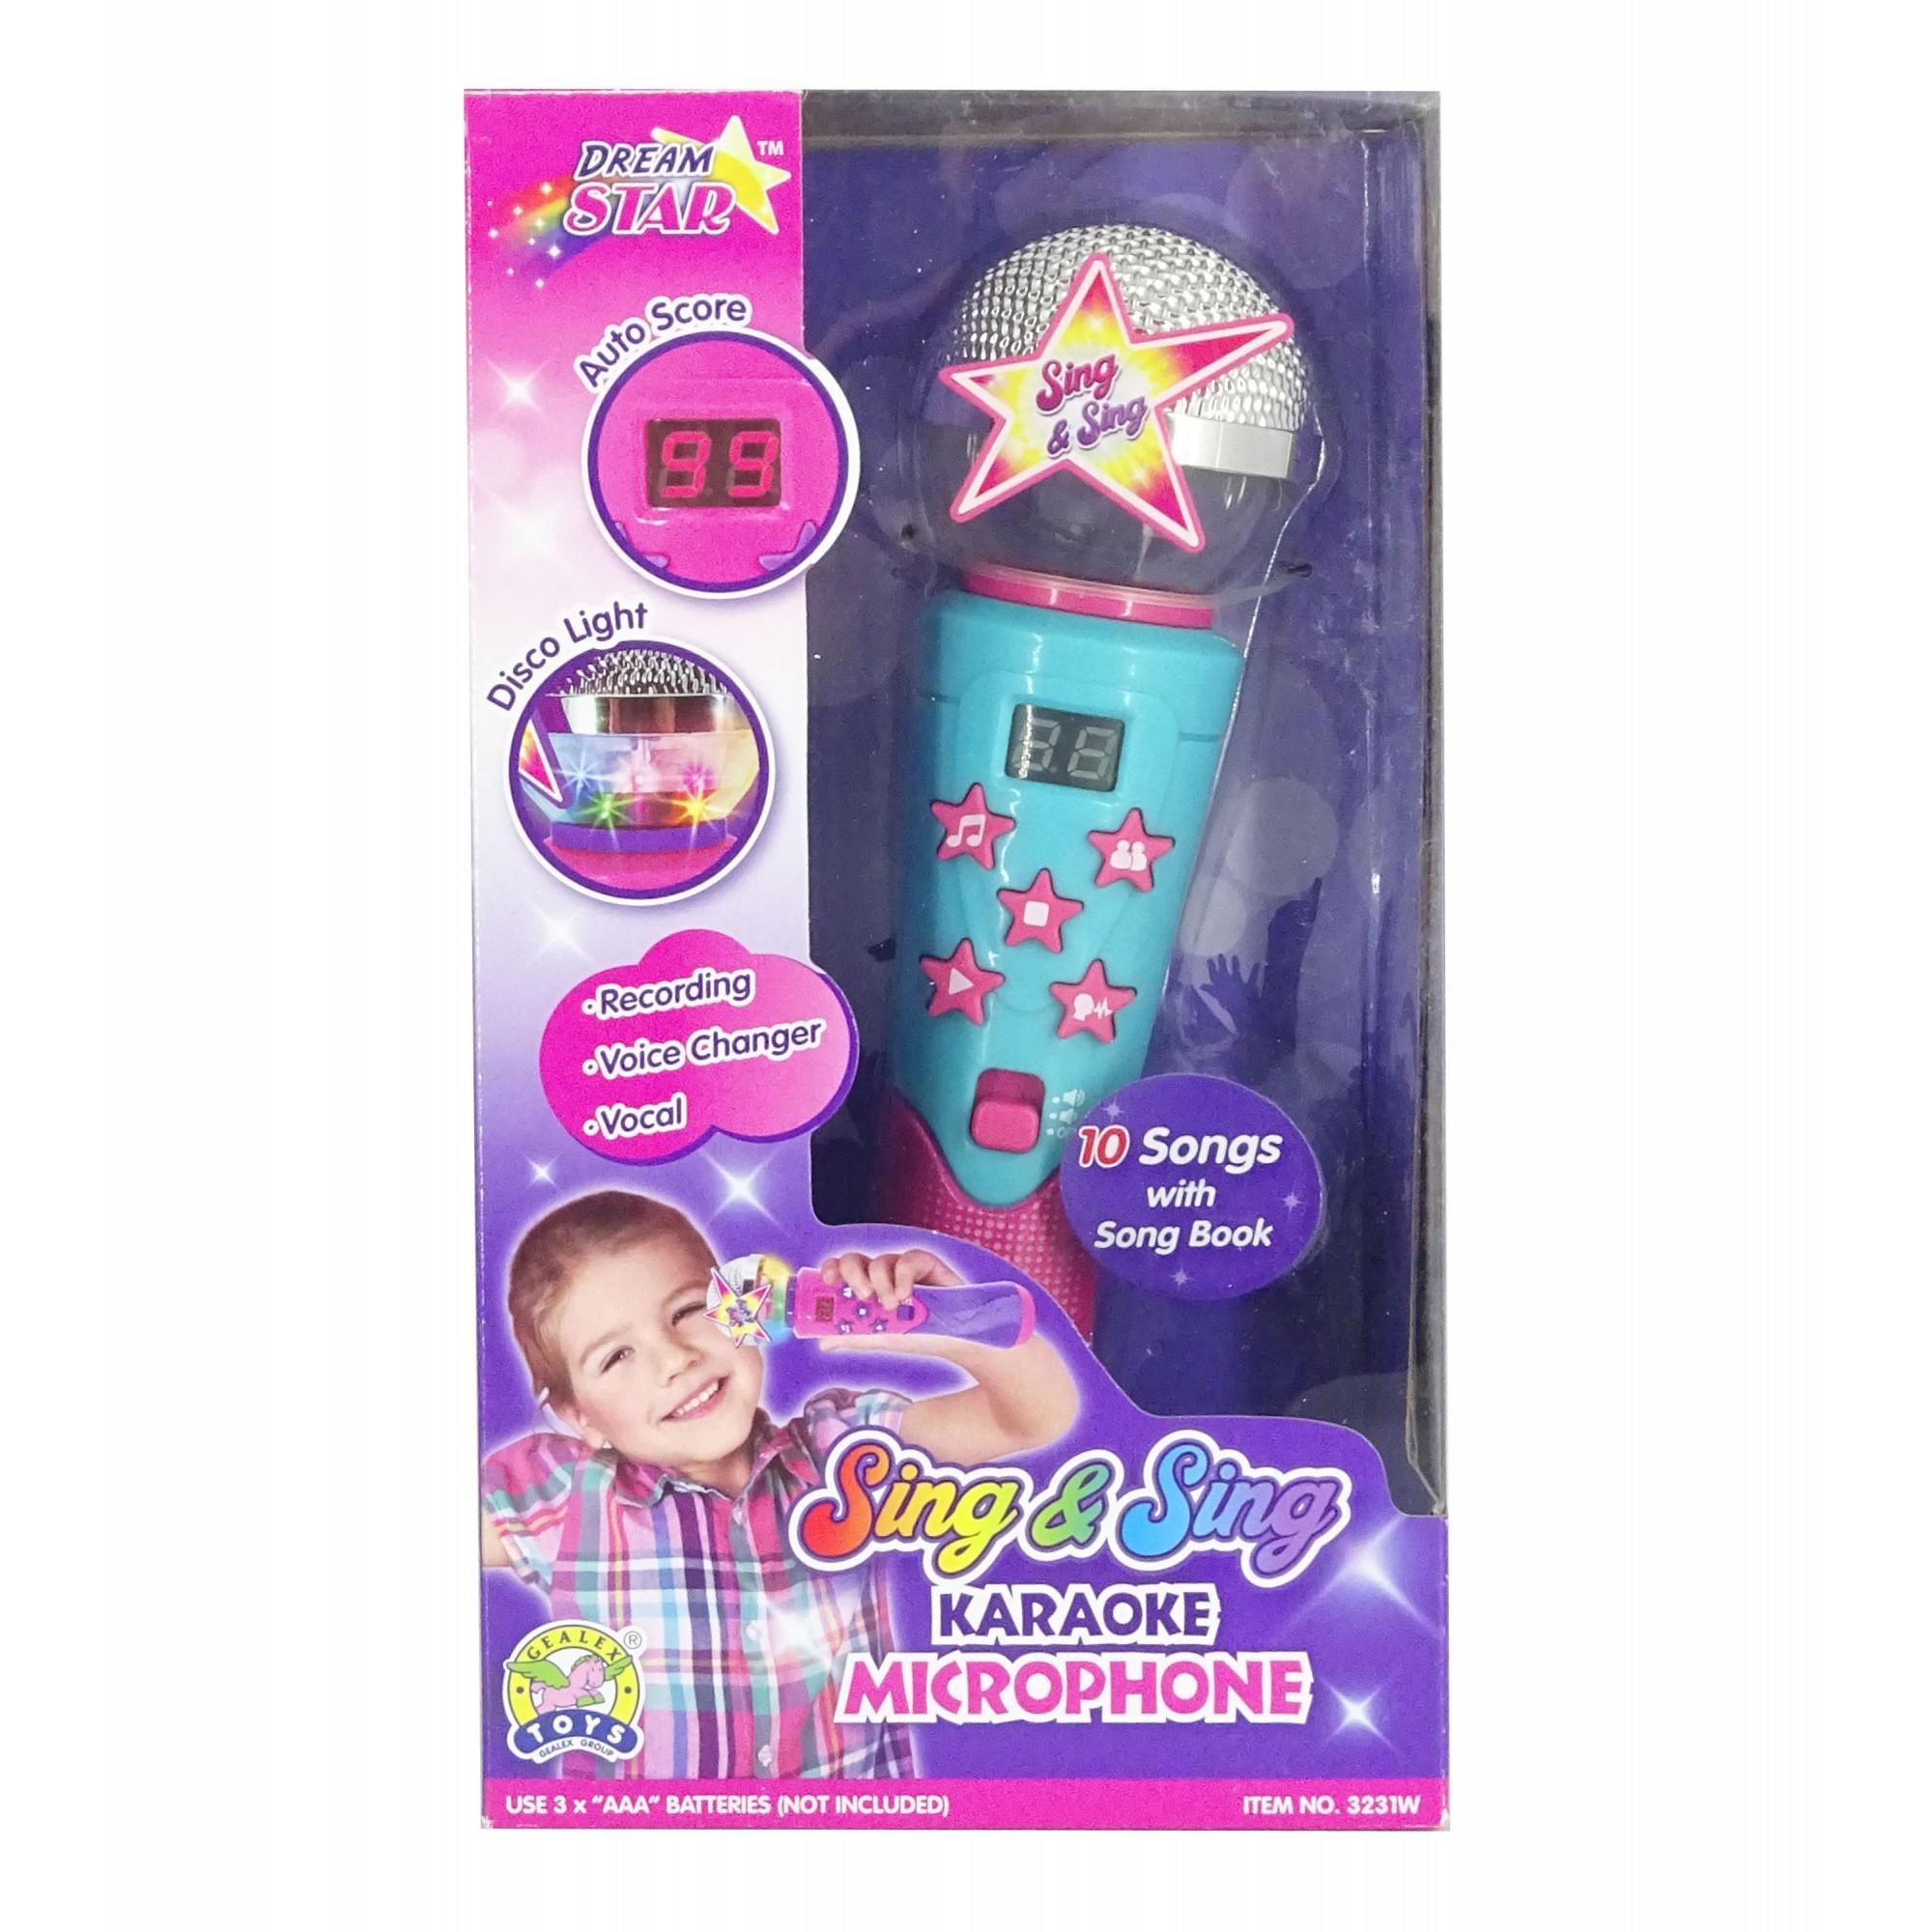 Sing & Sing Karaoke Microphone